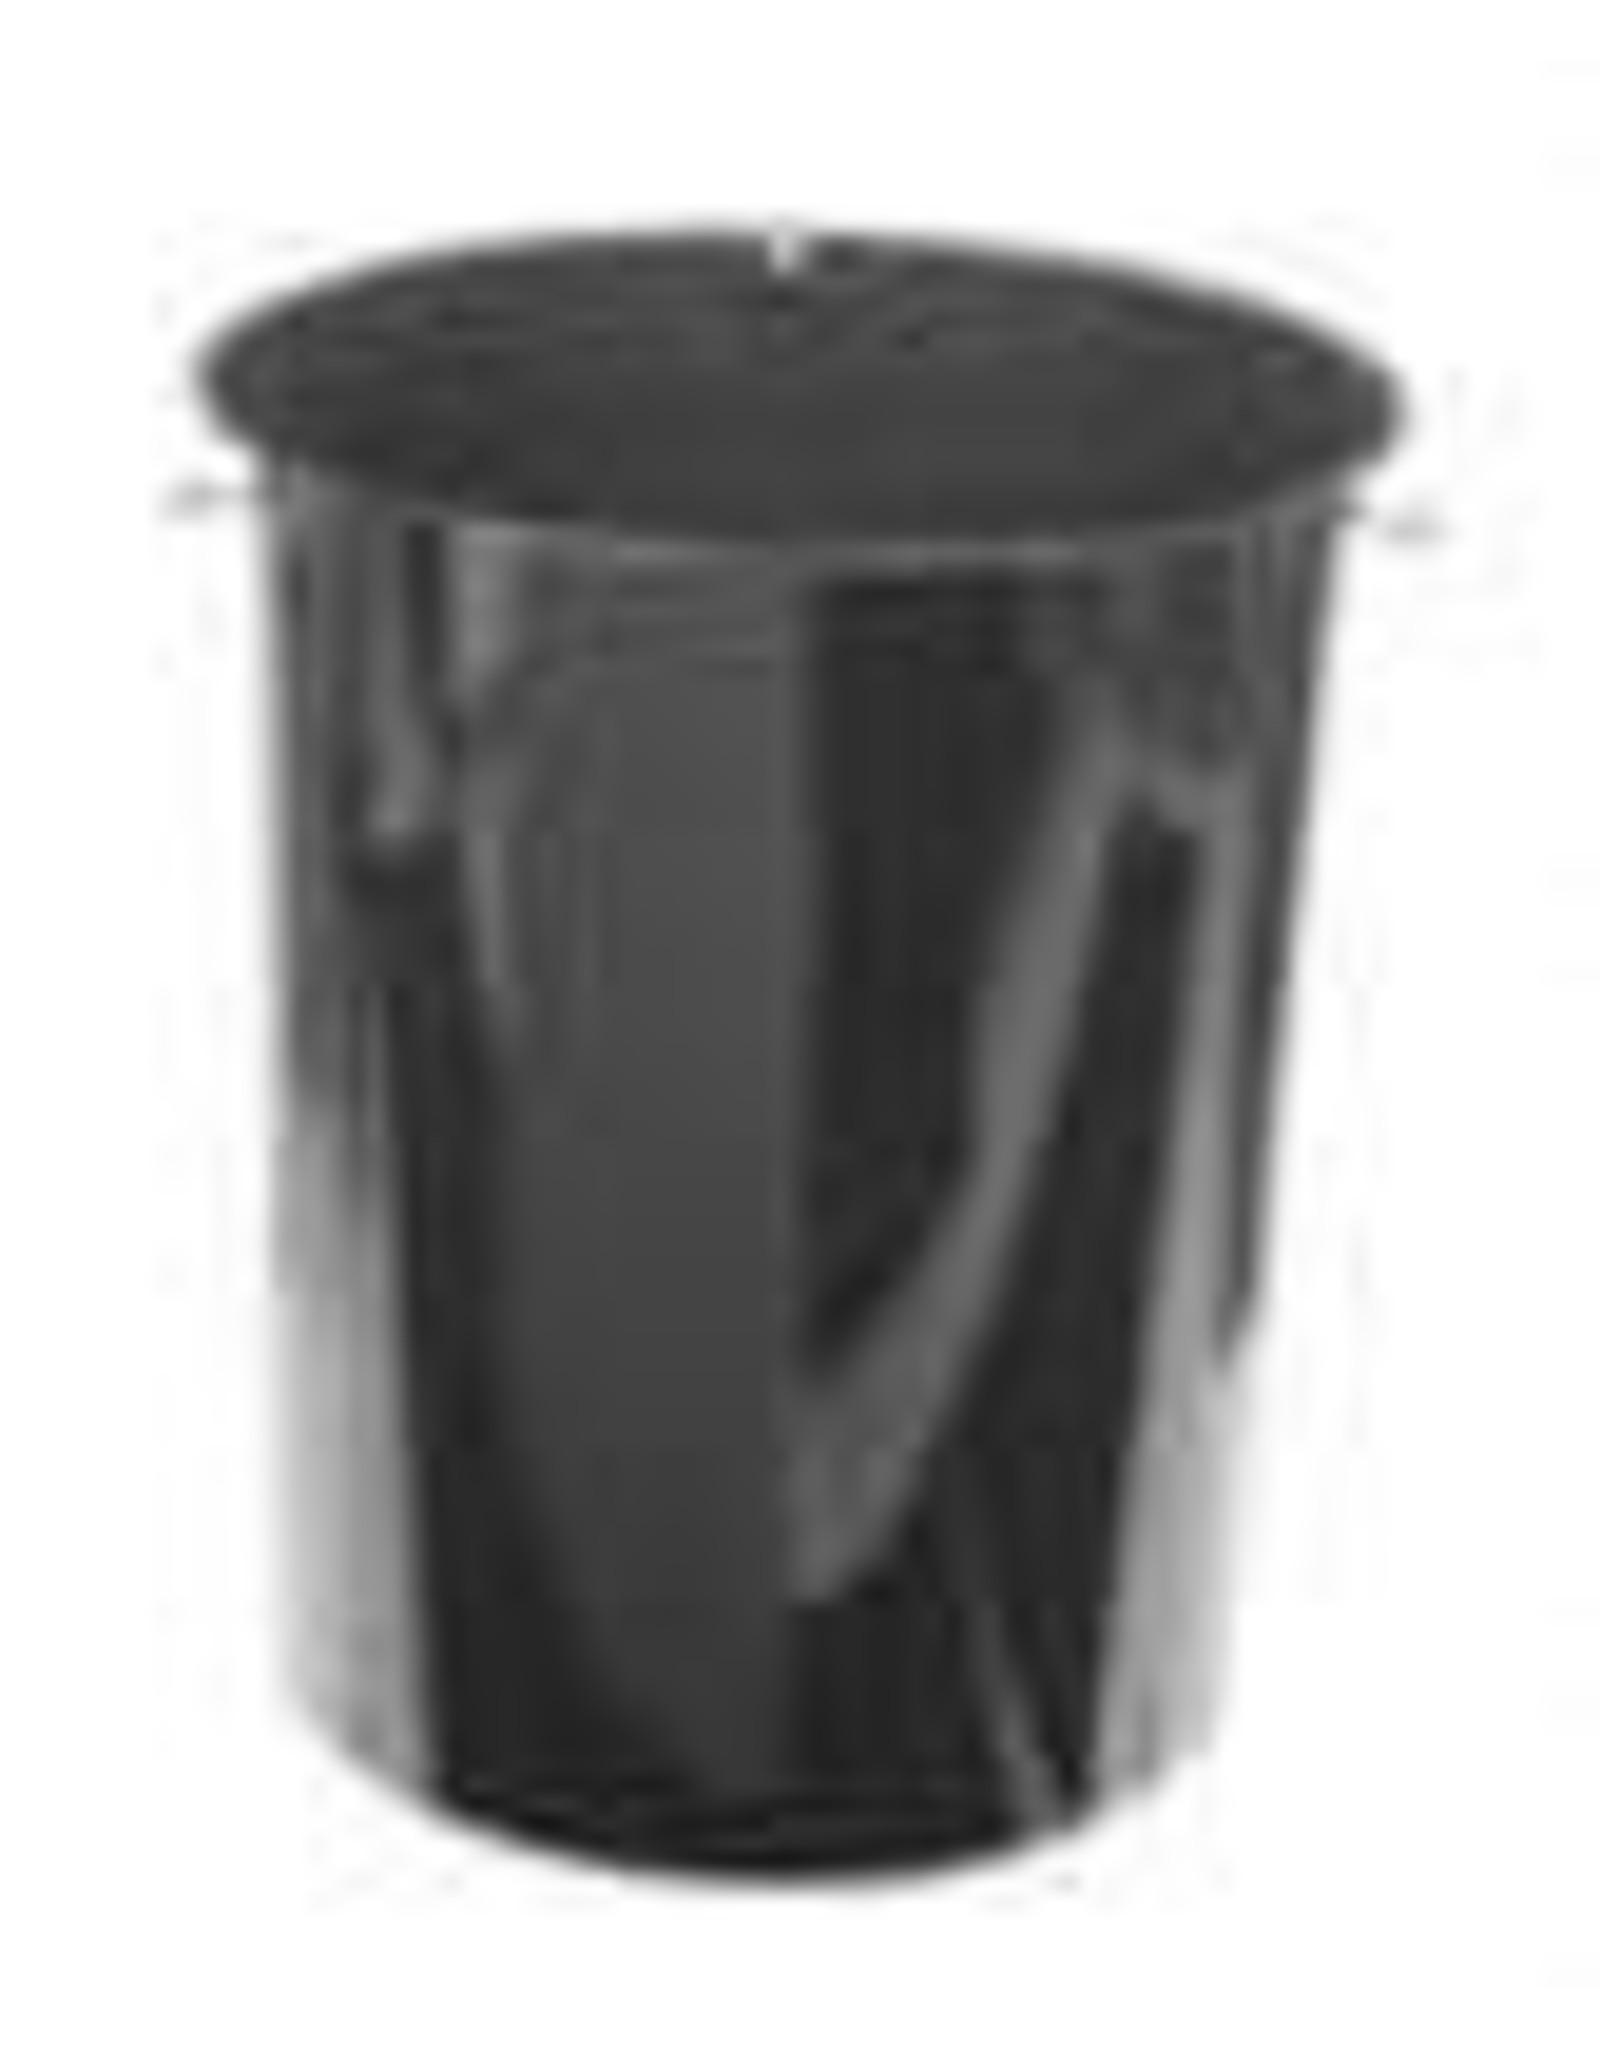 Astrozap Astrozap Celestron 11 SCT CPC Aluminum Dew Shield - with No Notches